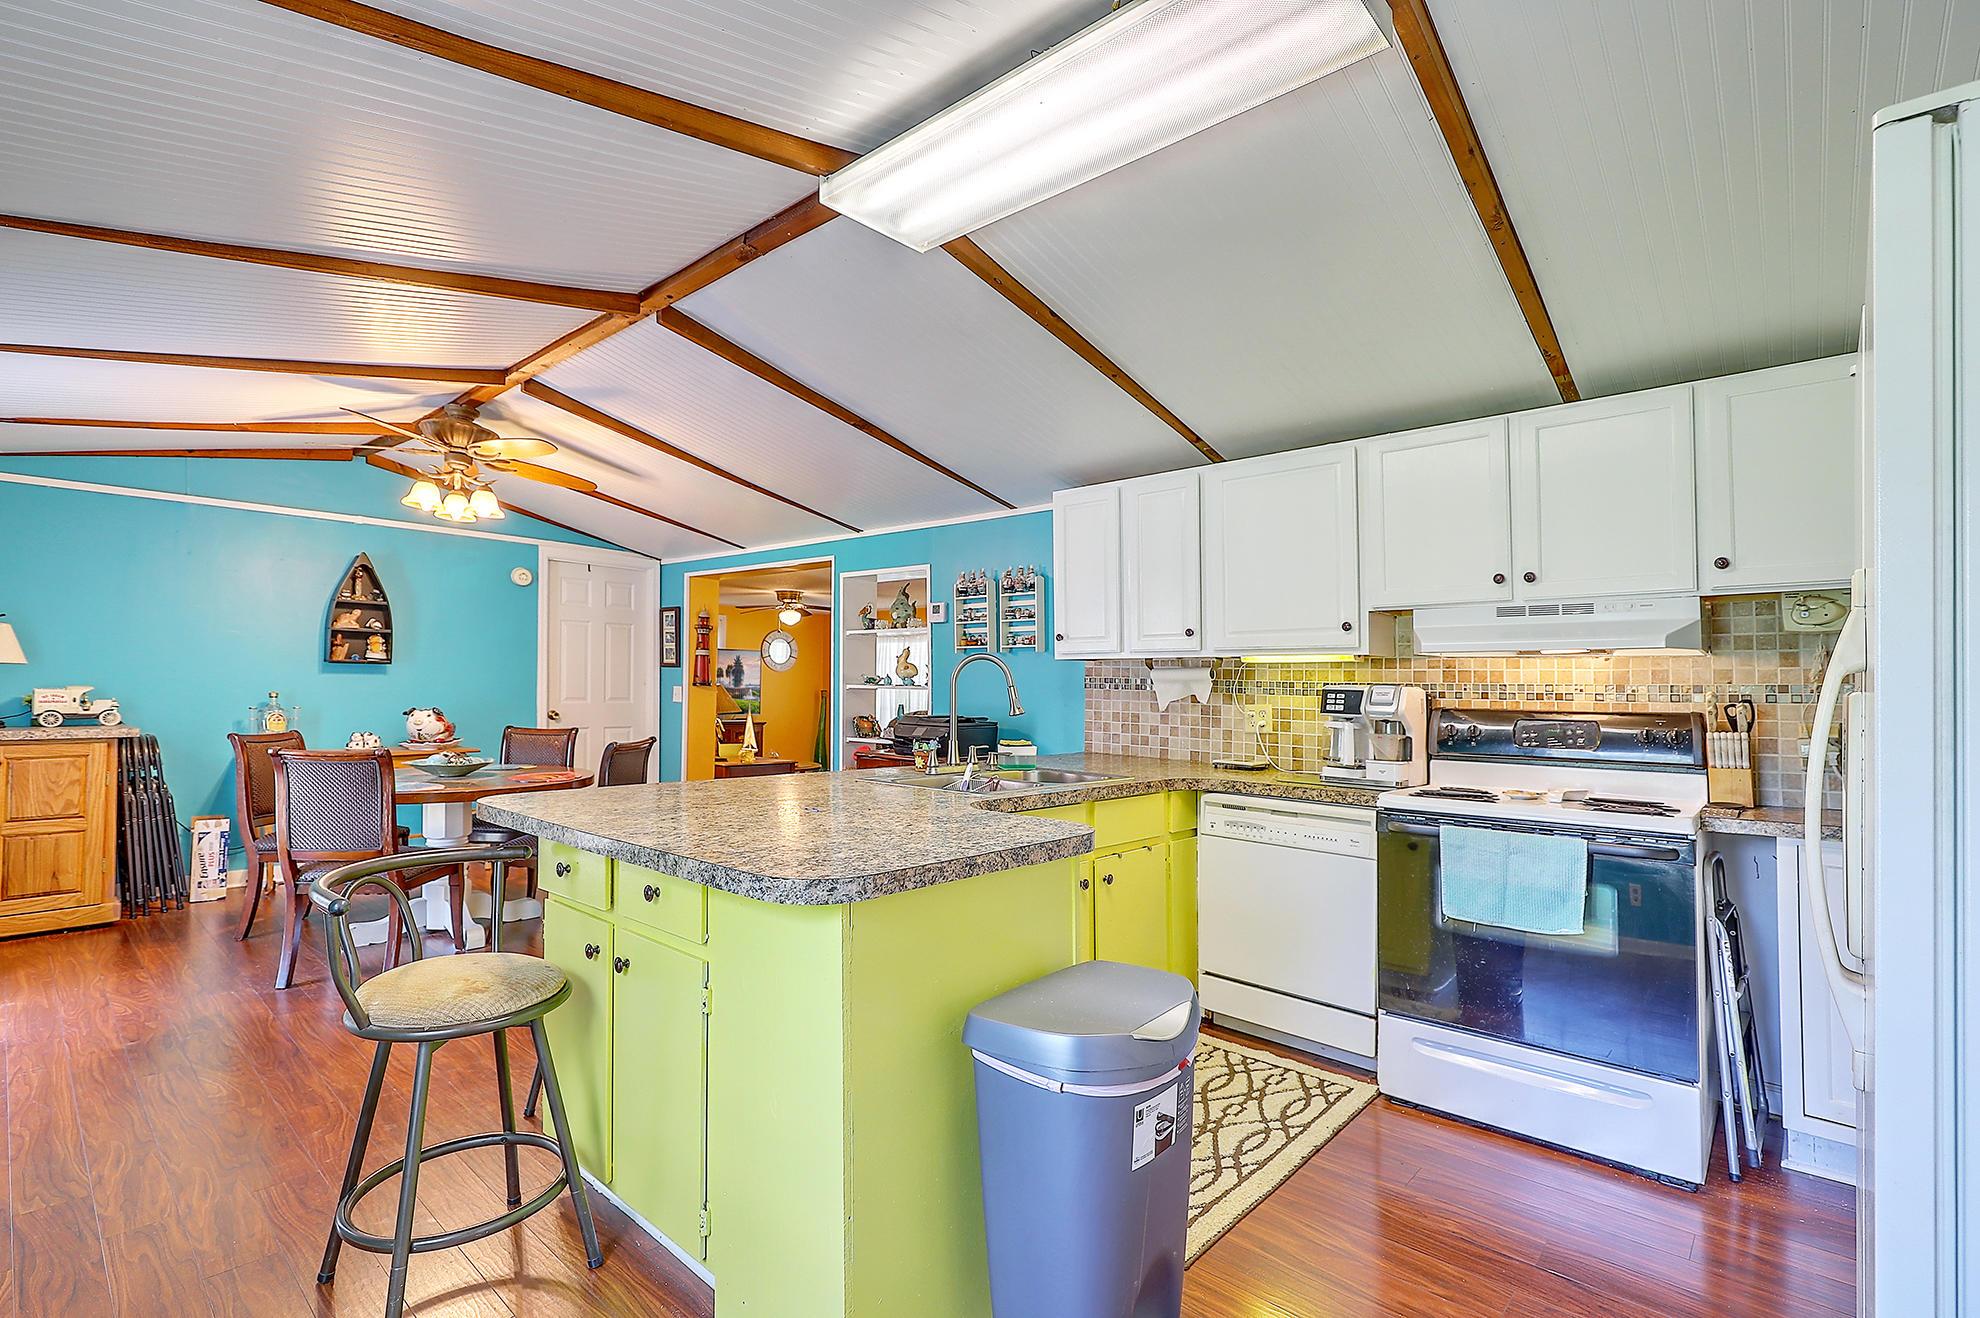 Cross Area (West) Homes For Sale - 128 Cherry Grove, Cross, SC - 39